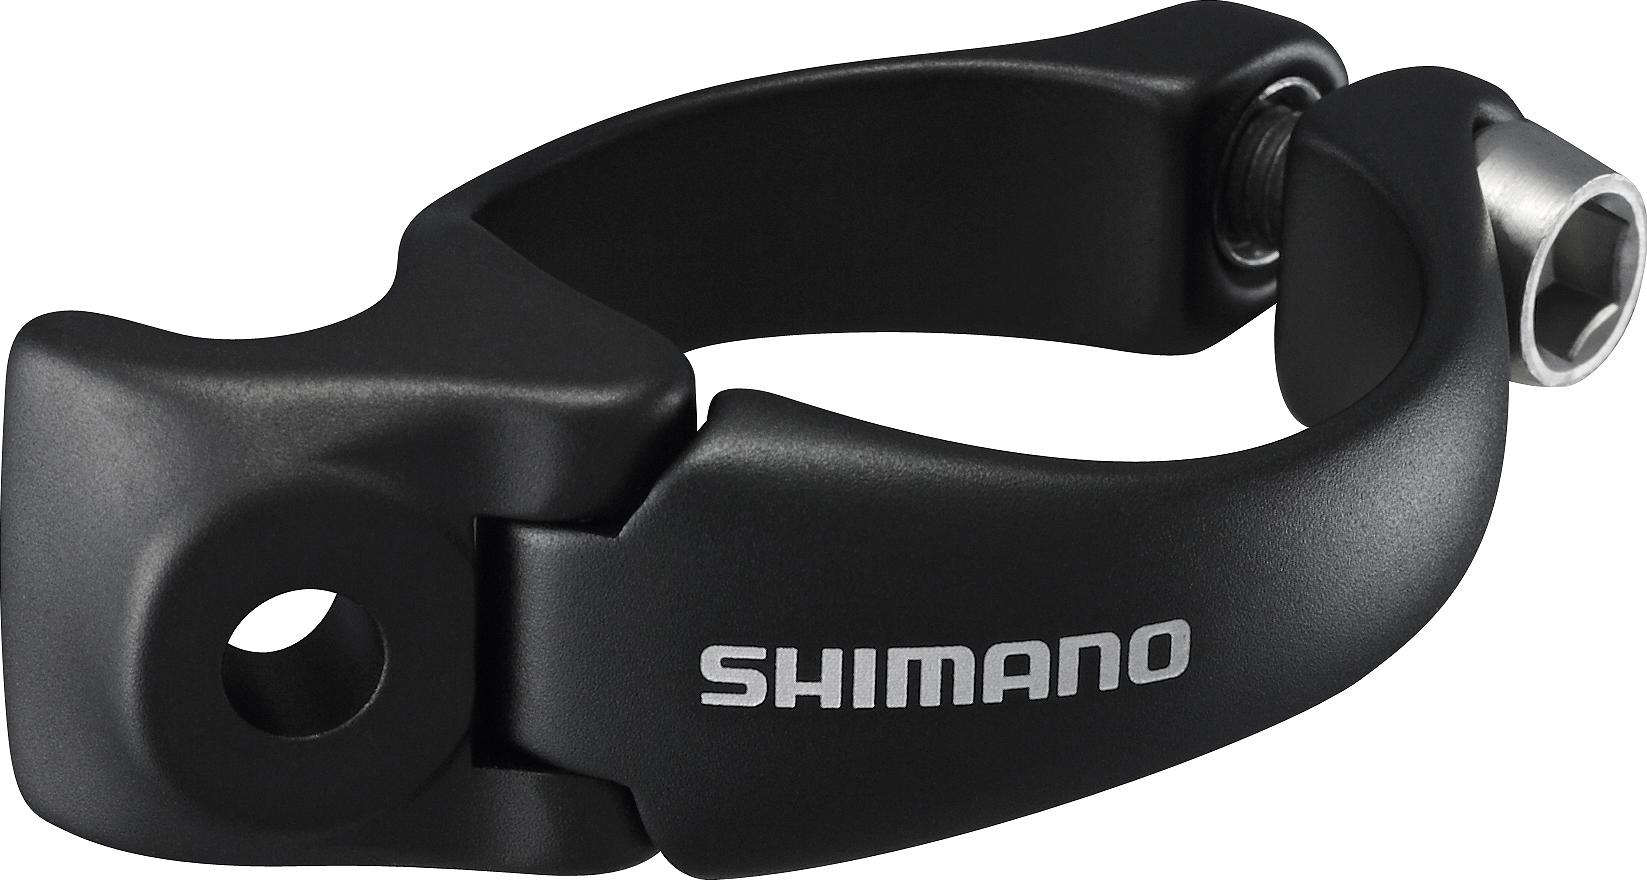 SHIMANO adaptér (objímka) pro FD-9070-F SM-AD90 L-velikost = 34,9mm bal